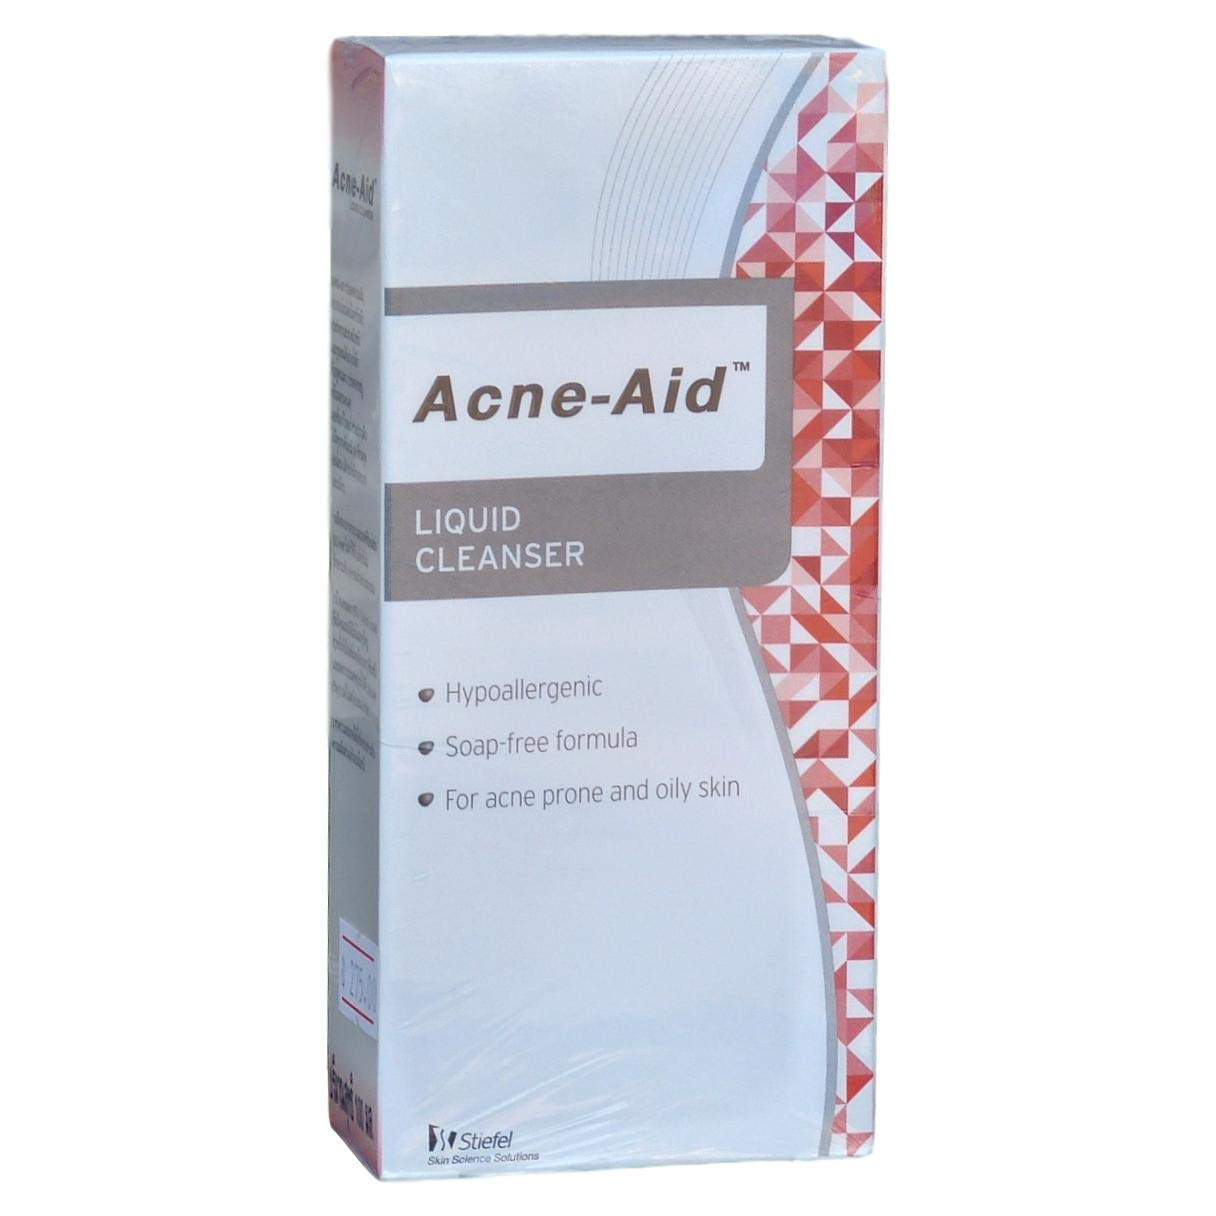 Acne-aid Liquid Cleanser for Pimples Skin : 100ml.